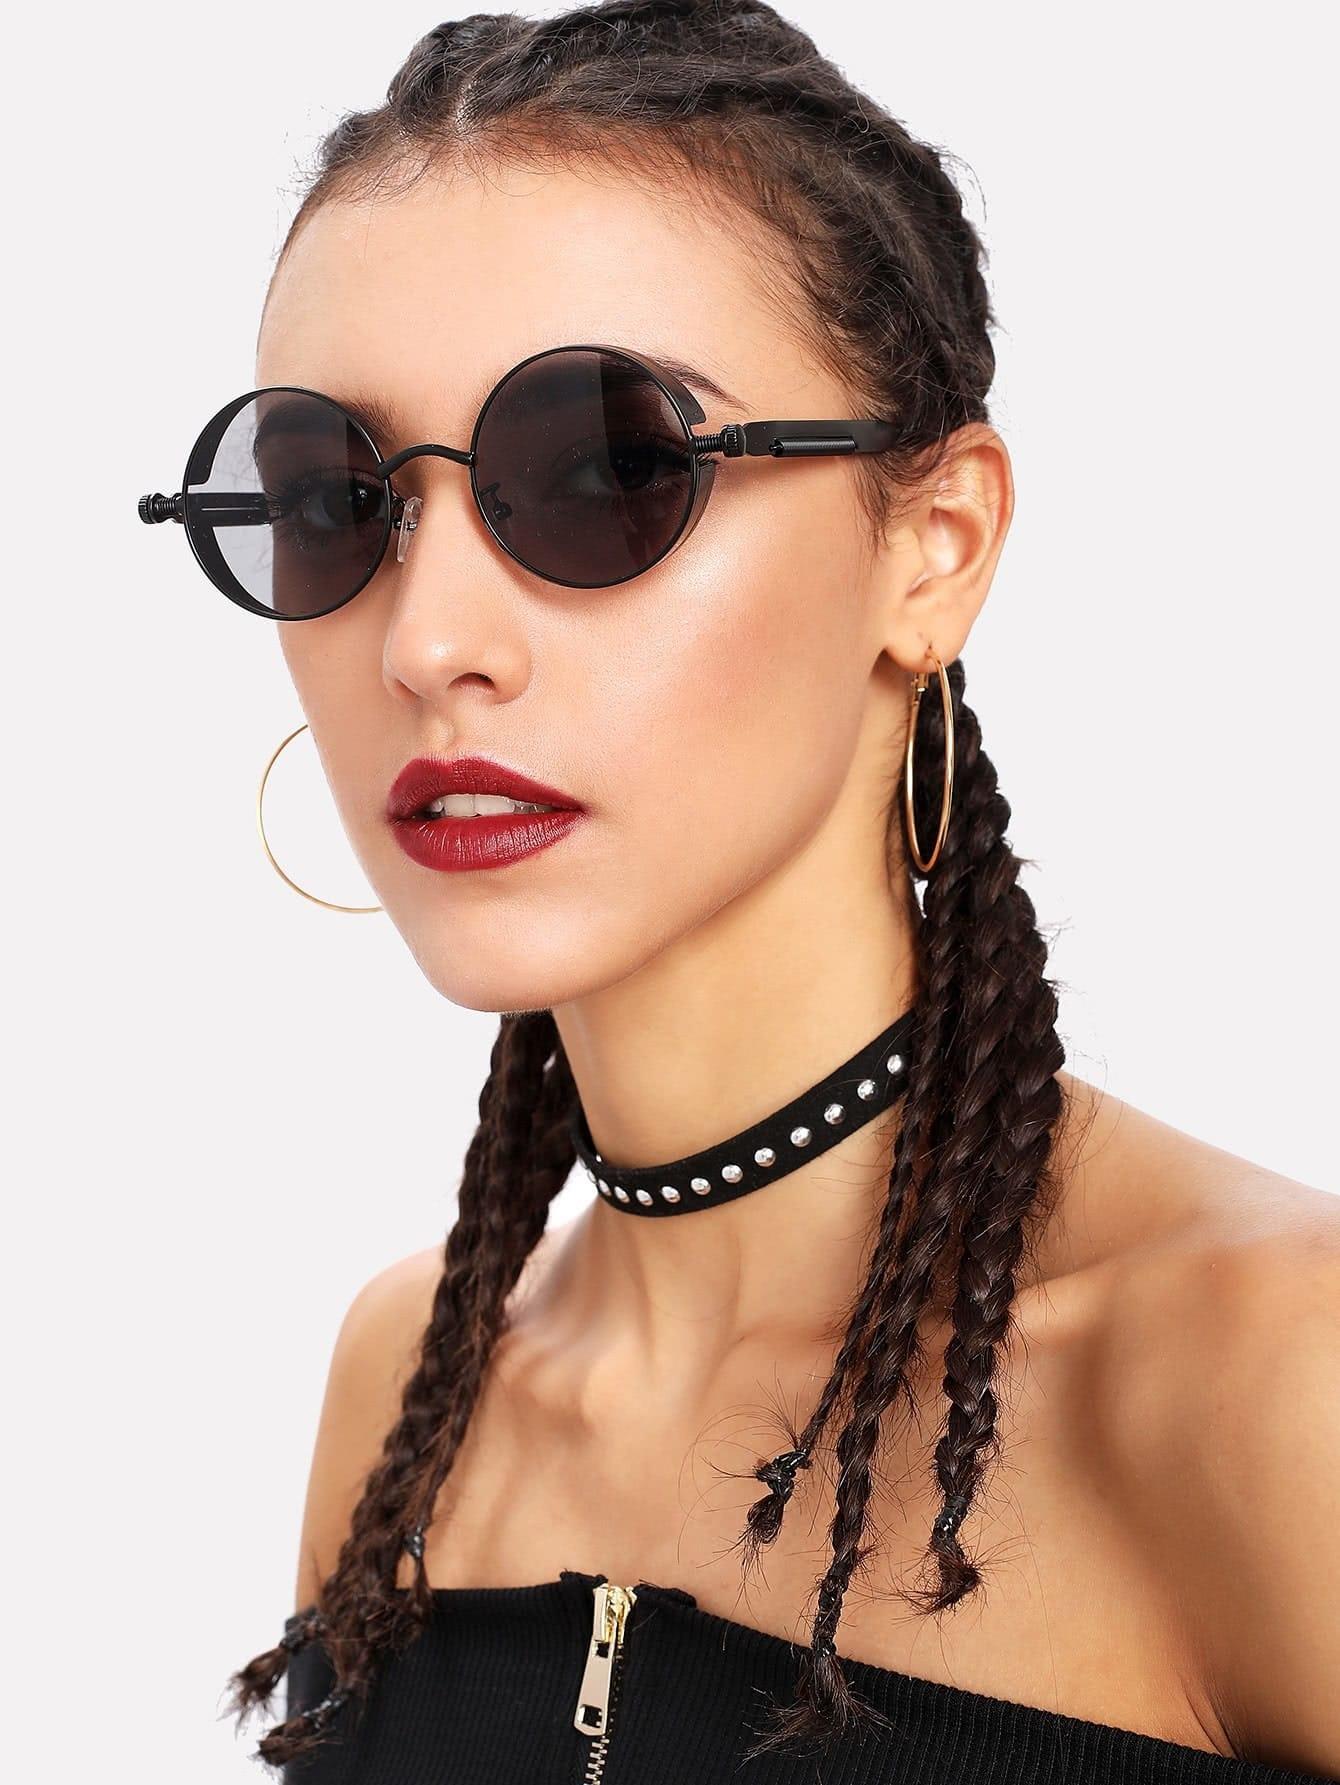 Round Lens Sunglasses round lens sunglasses